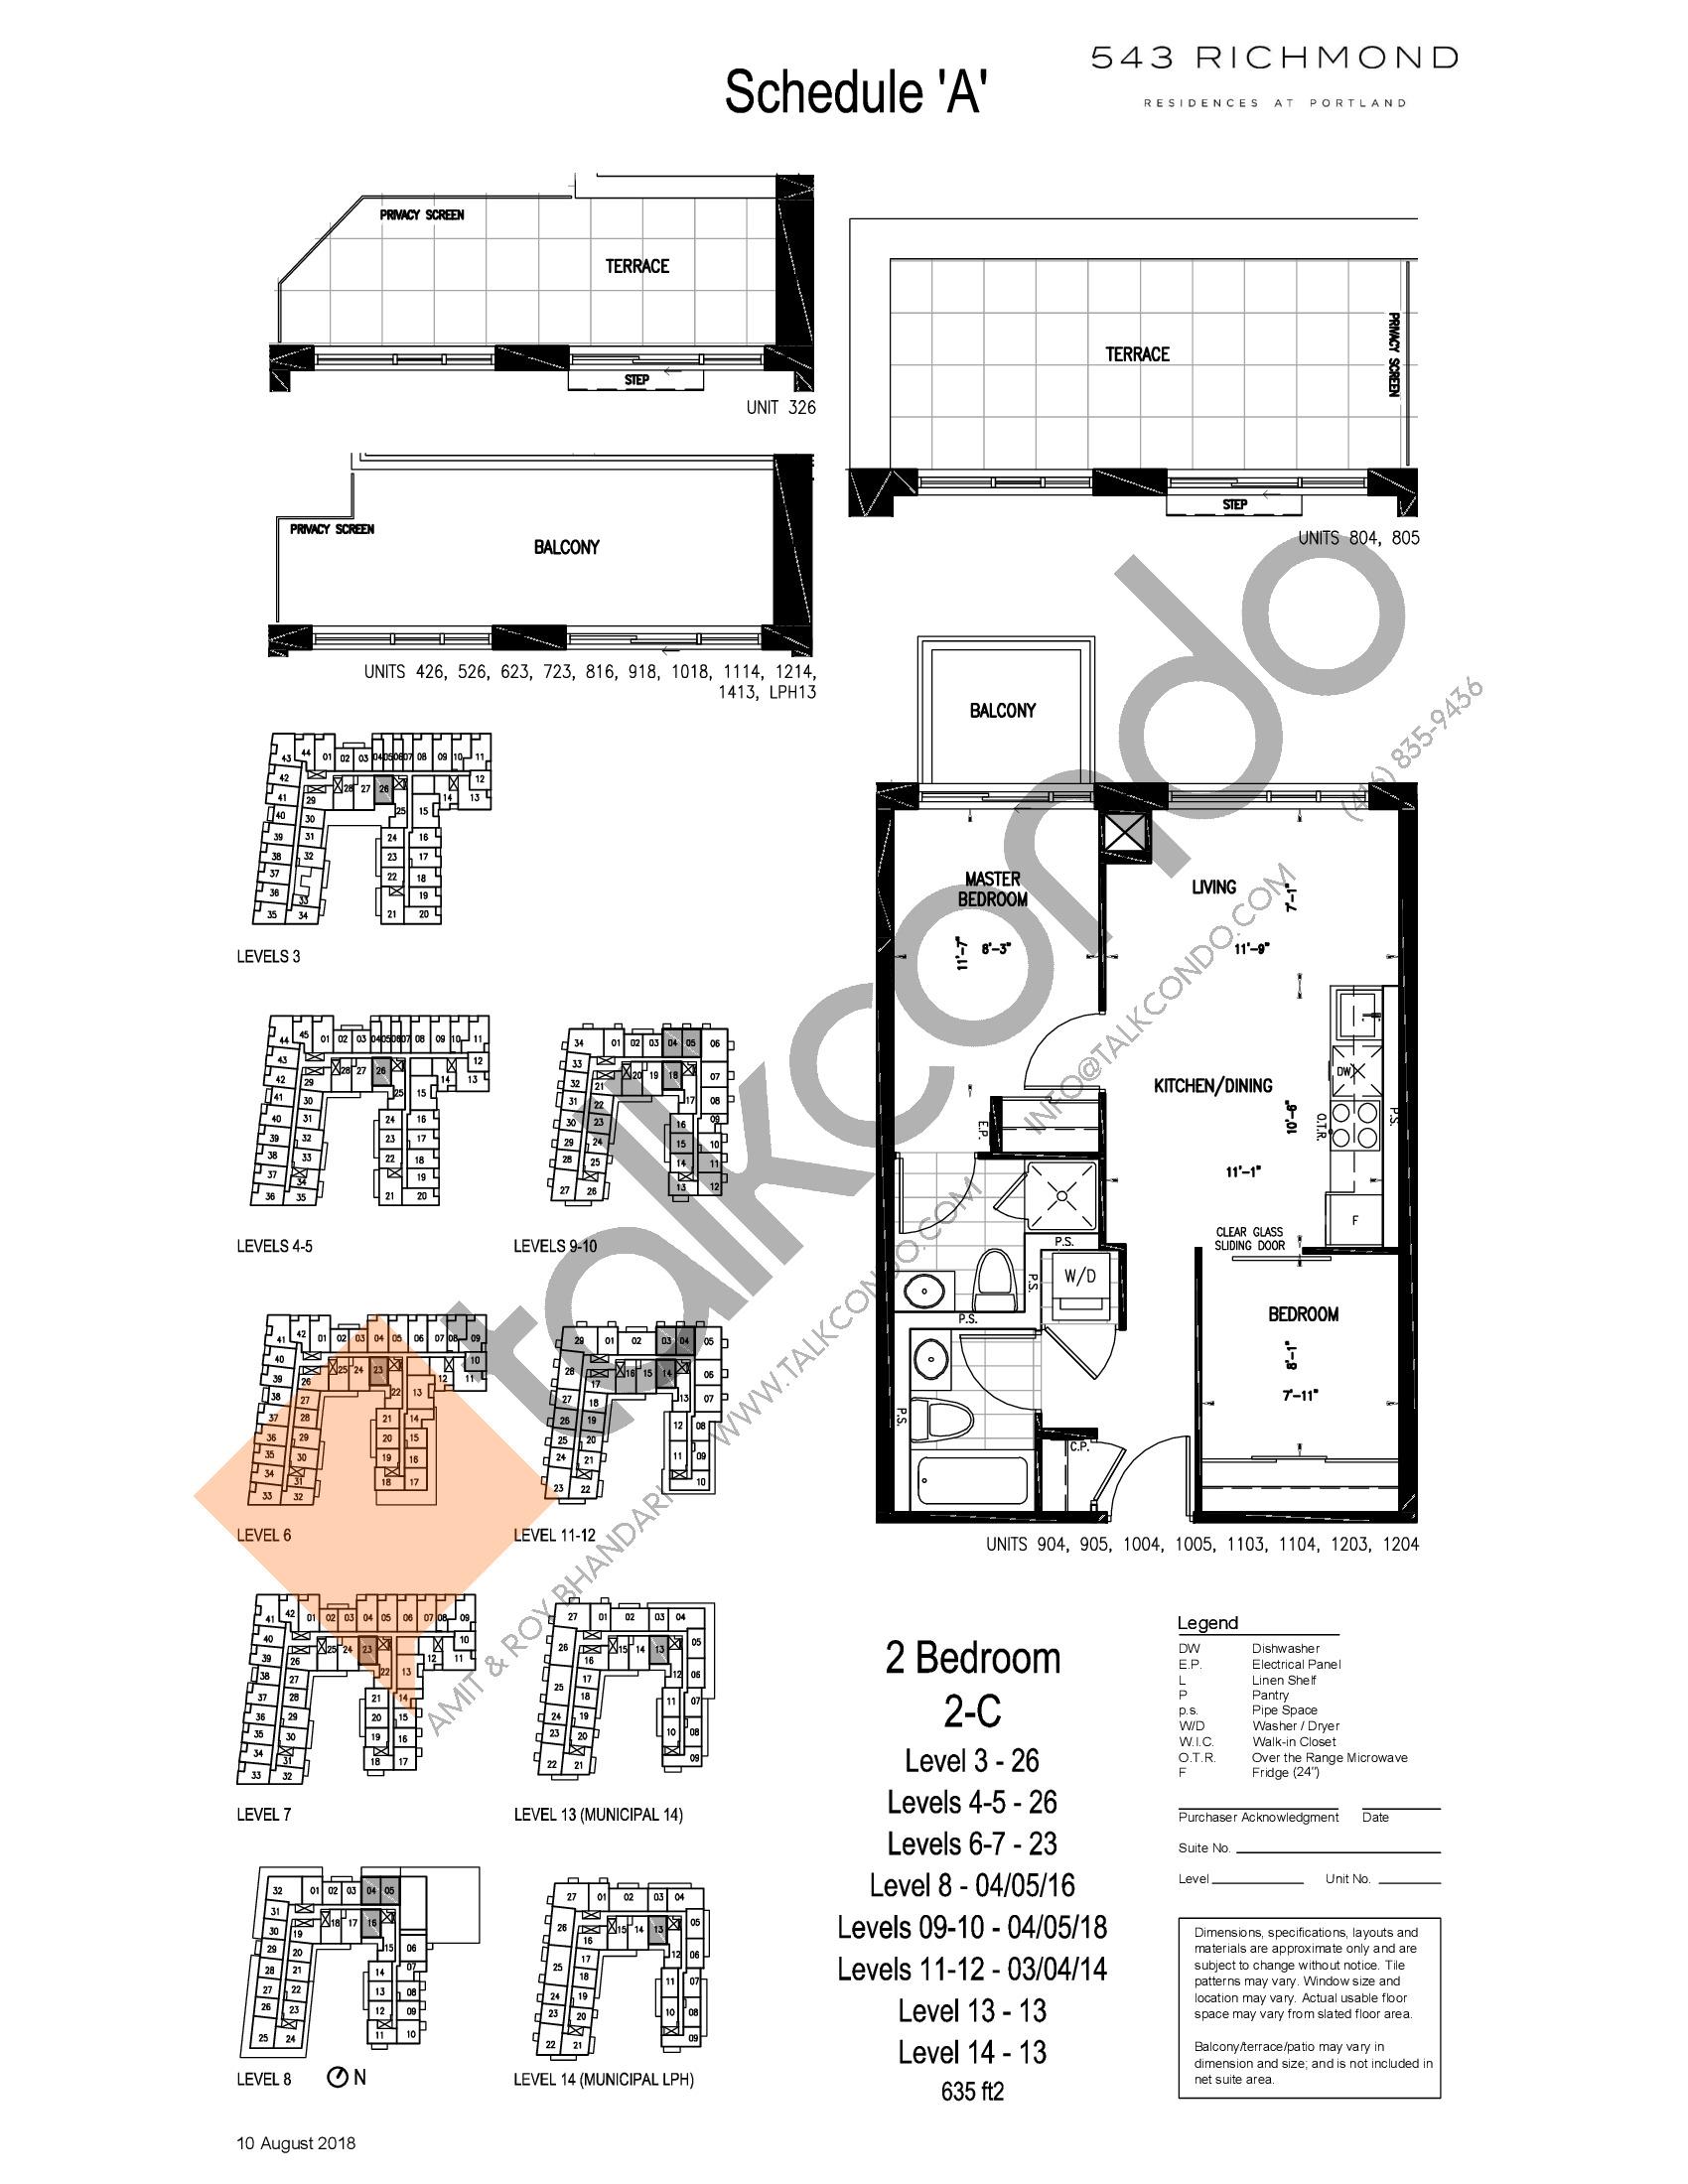 2-C Floor Plan at 543 Richmond St Condos - 635 sq.ft